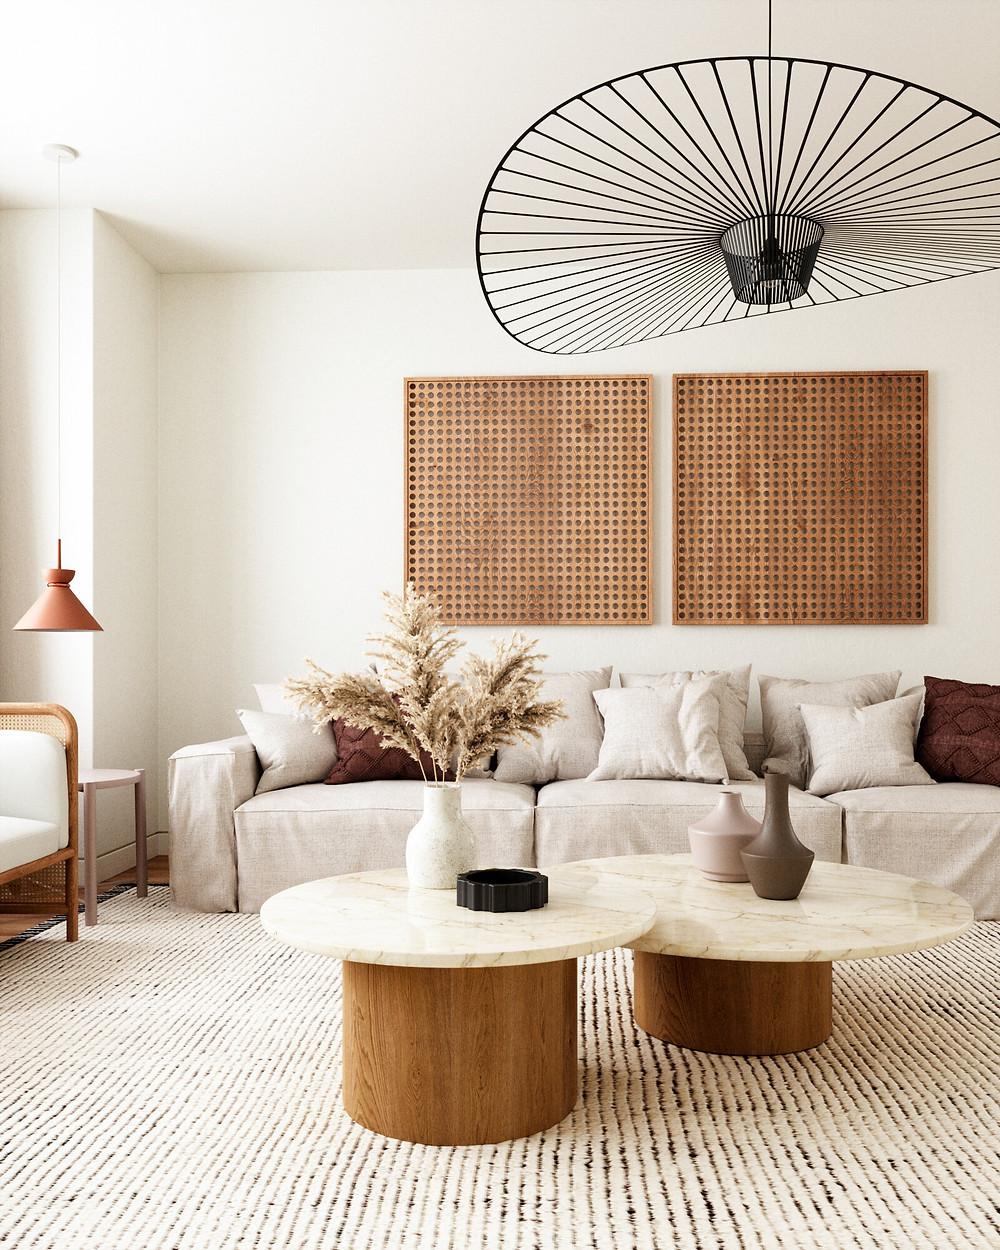 Wabi-sabi style interior design from Canadian Interior Design studio, Anthology Creative Studio Anthology Interiors